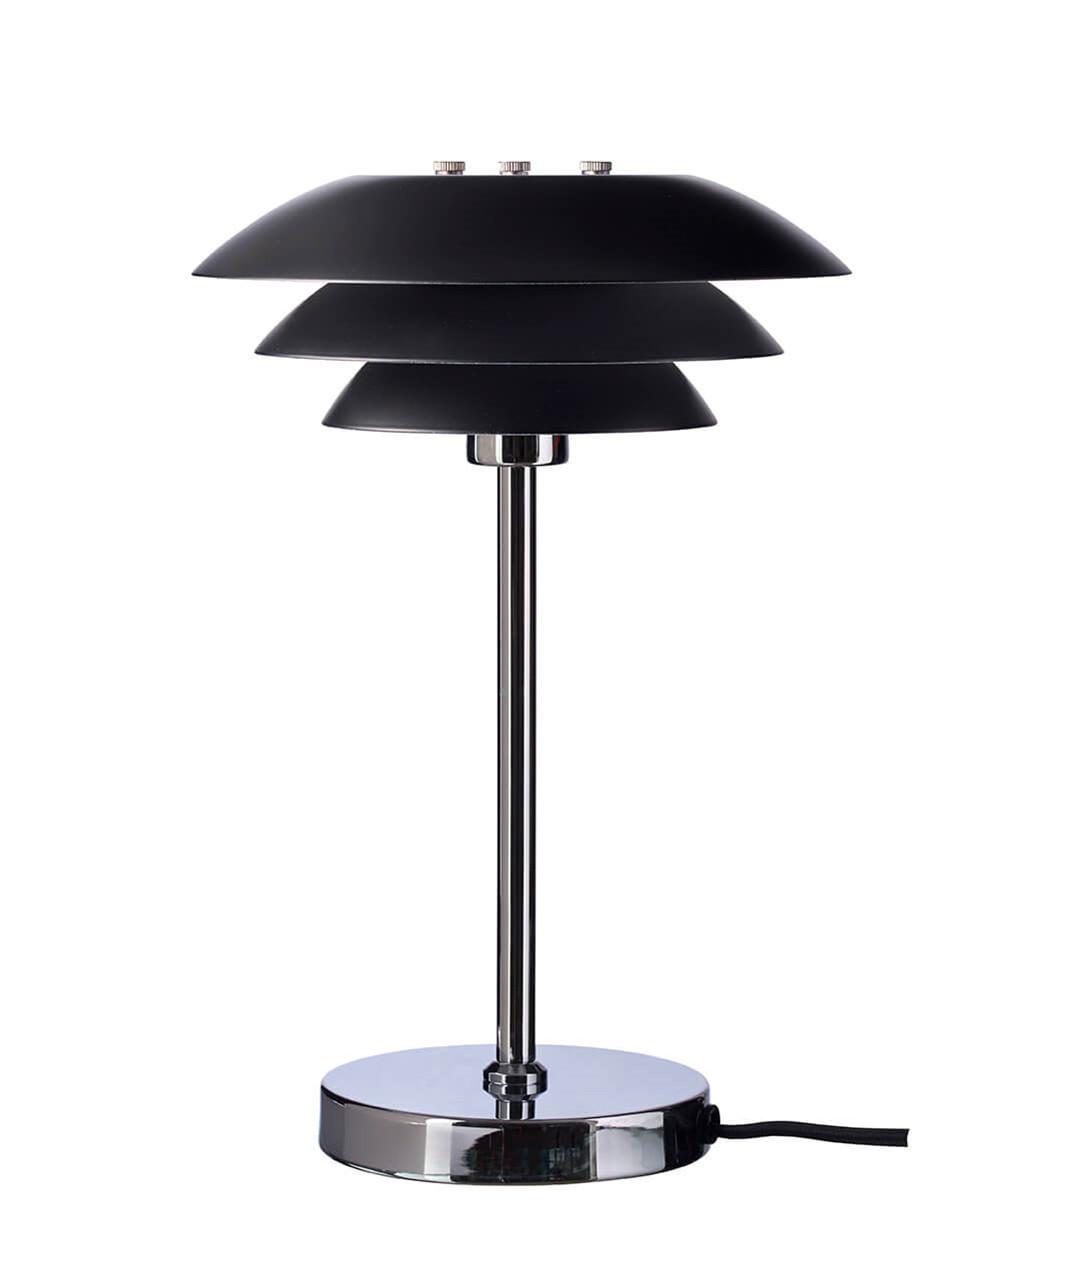 Image of   DL20 Bordlampe Sort - DybergLarsen